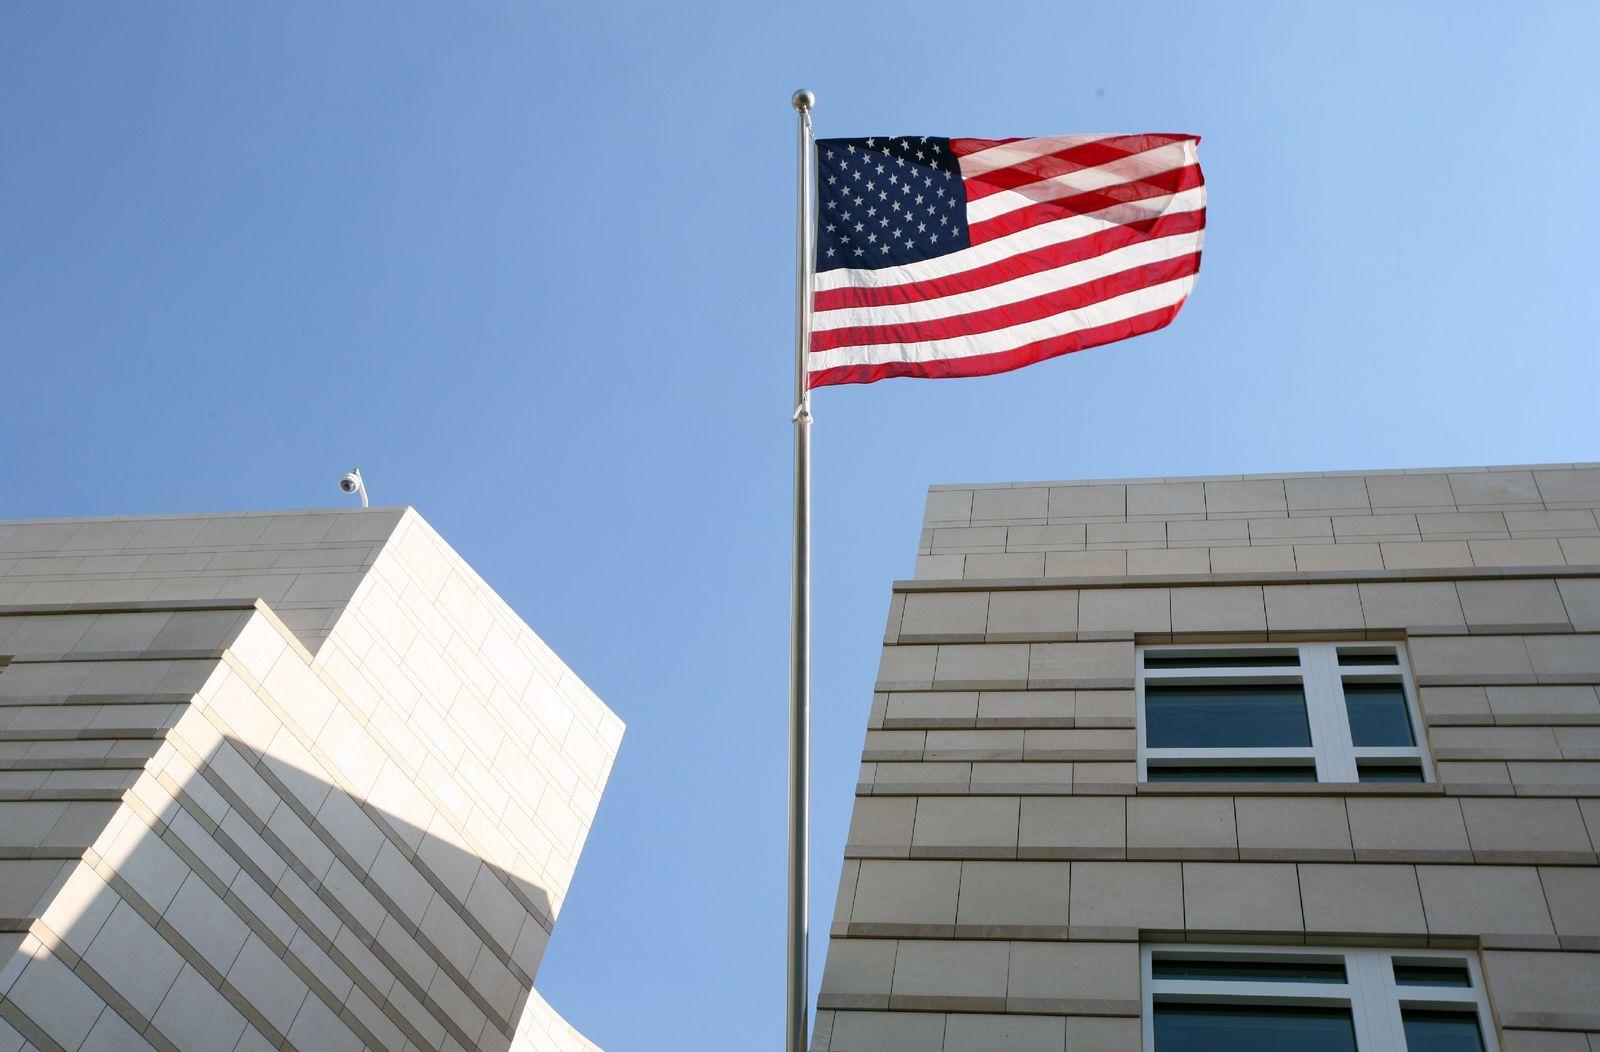 Vorbereitungen Eröffnung US-Botschaft am Pariser Platz